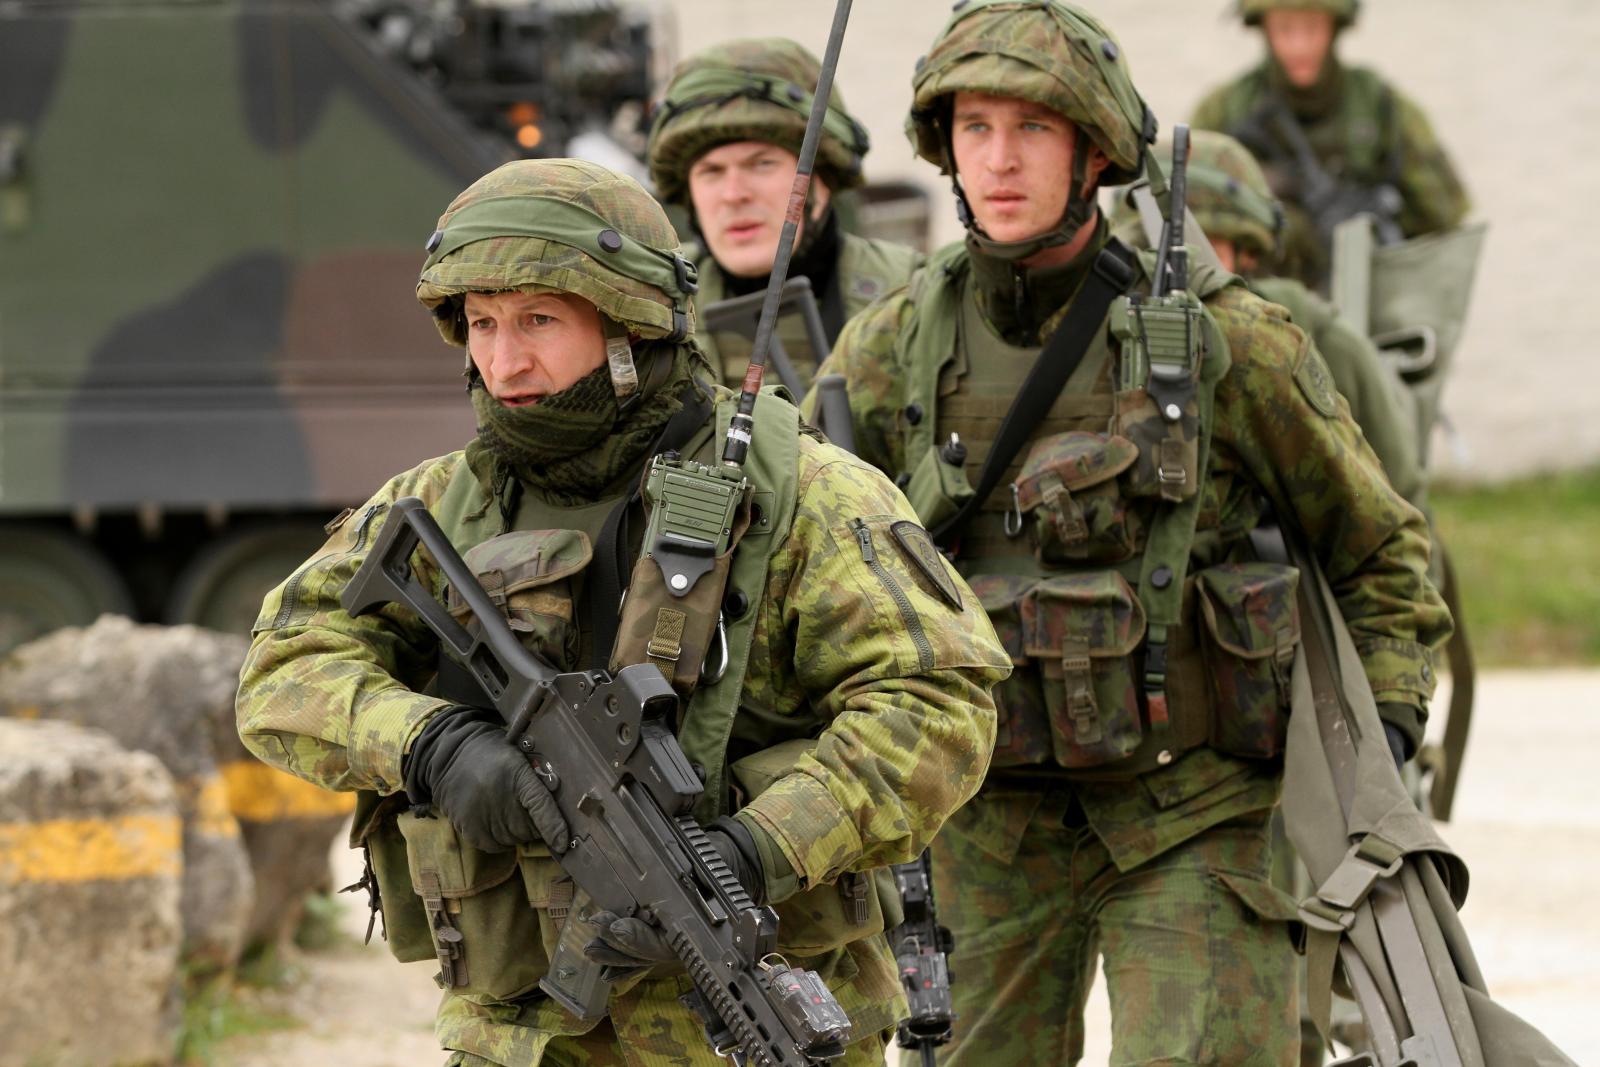 Армия фото картинки, свадьбой дочери